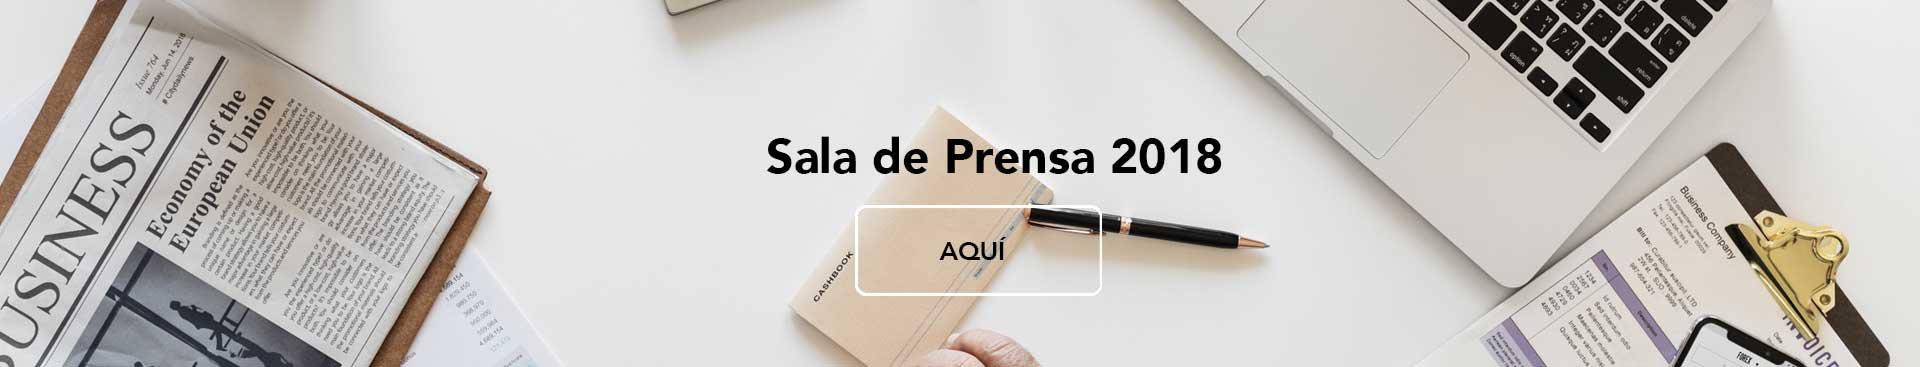 Sala de Prensa Agremia 2018